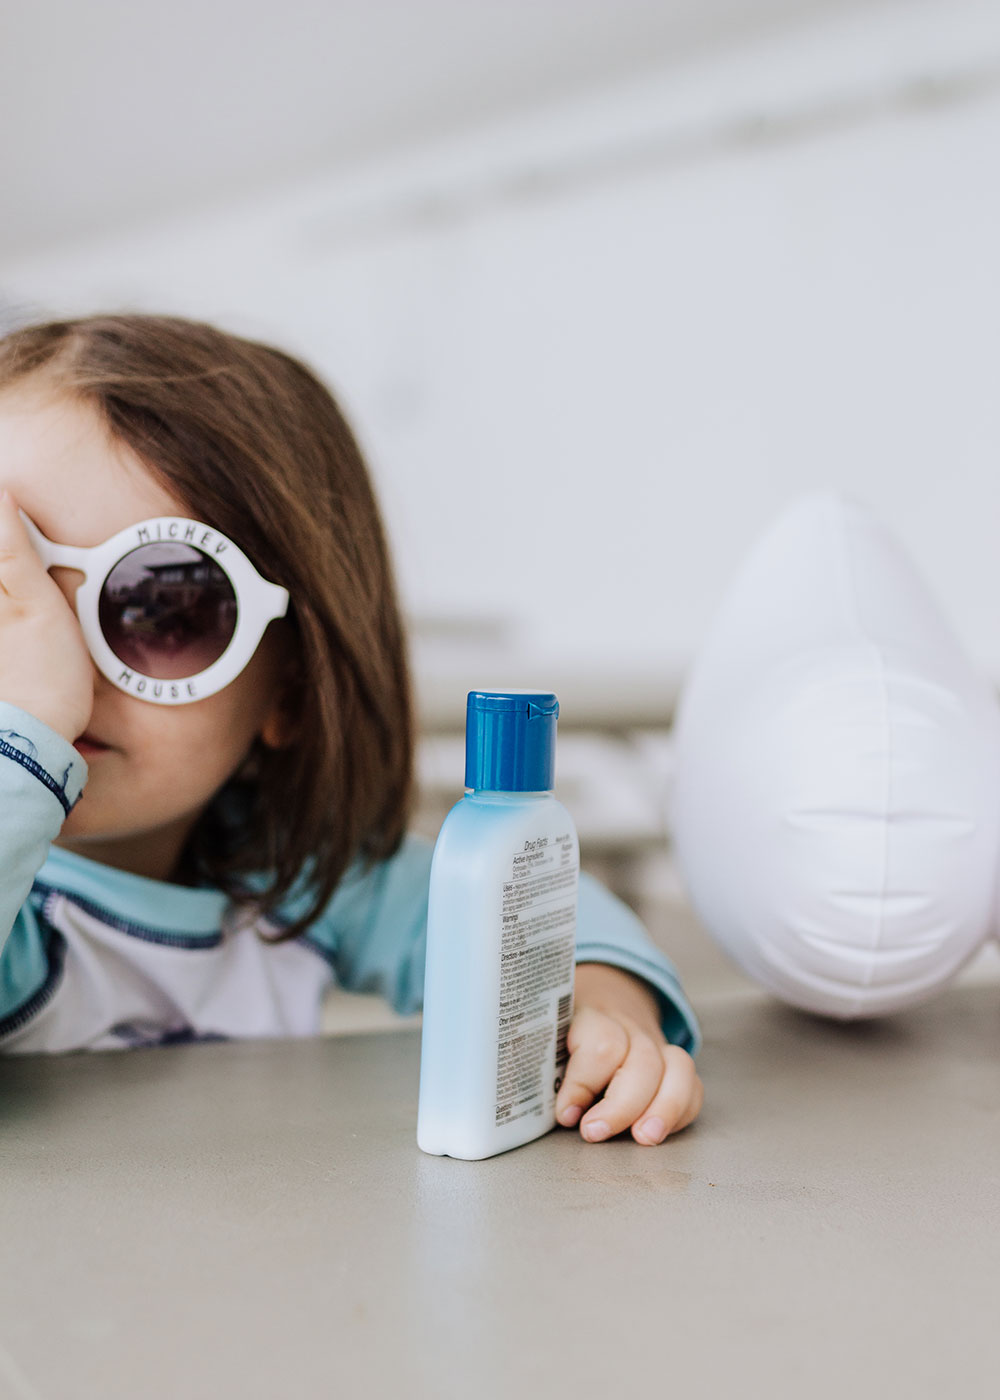 Blue Lizard Australian Sunscreen has natural, mineral based, safe skin ingredients!   thelovedesignedlife.com #summertime #sunscreen